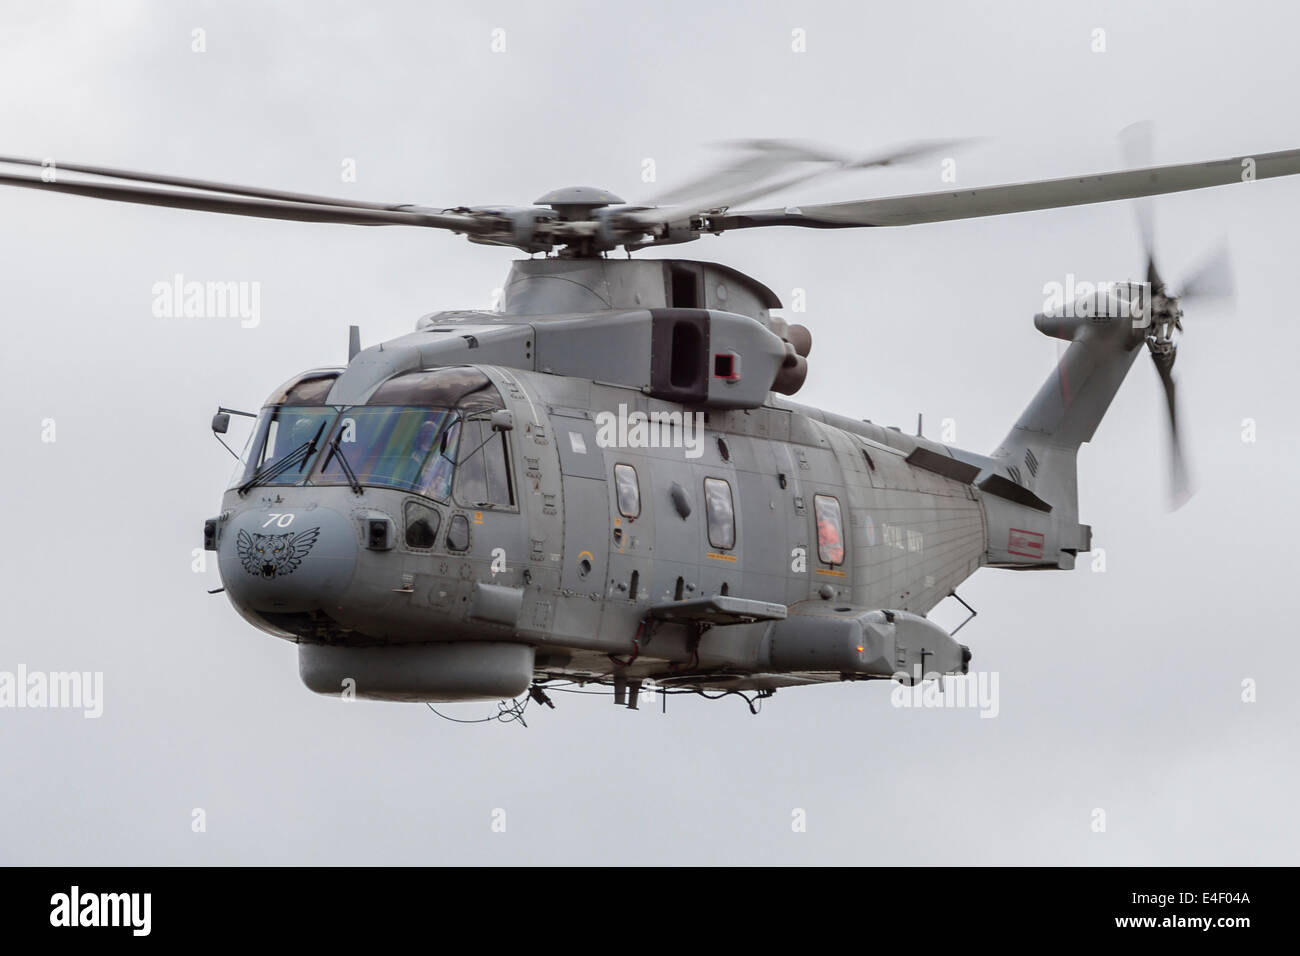 Royal Navy EH-101 Merlin in flight, Jagel, Germany. - Stock Image